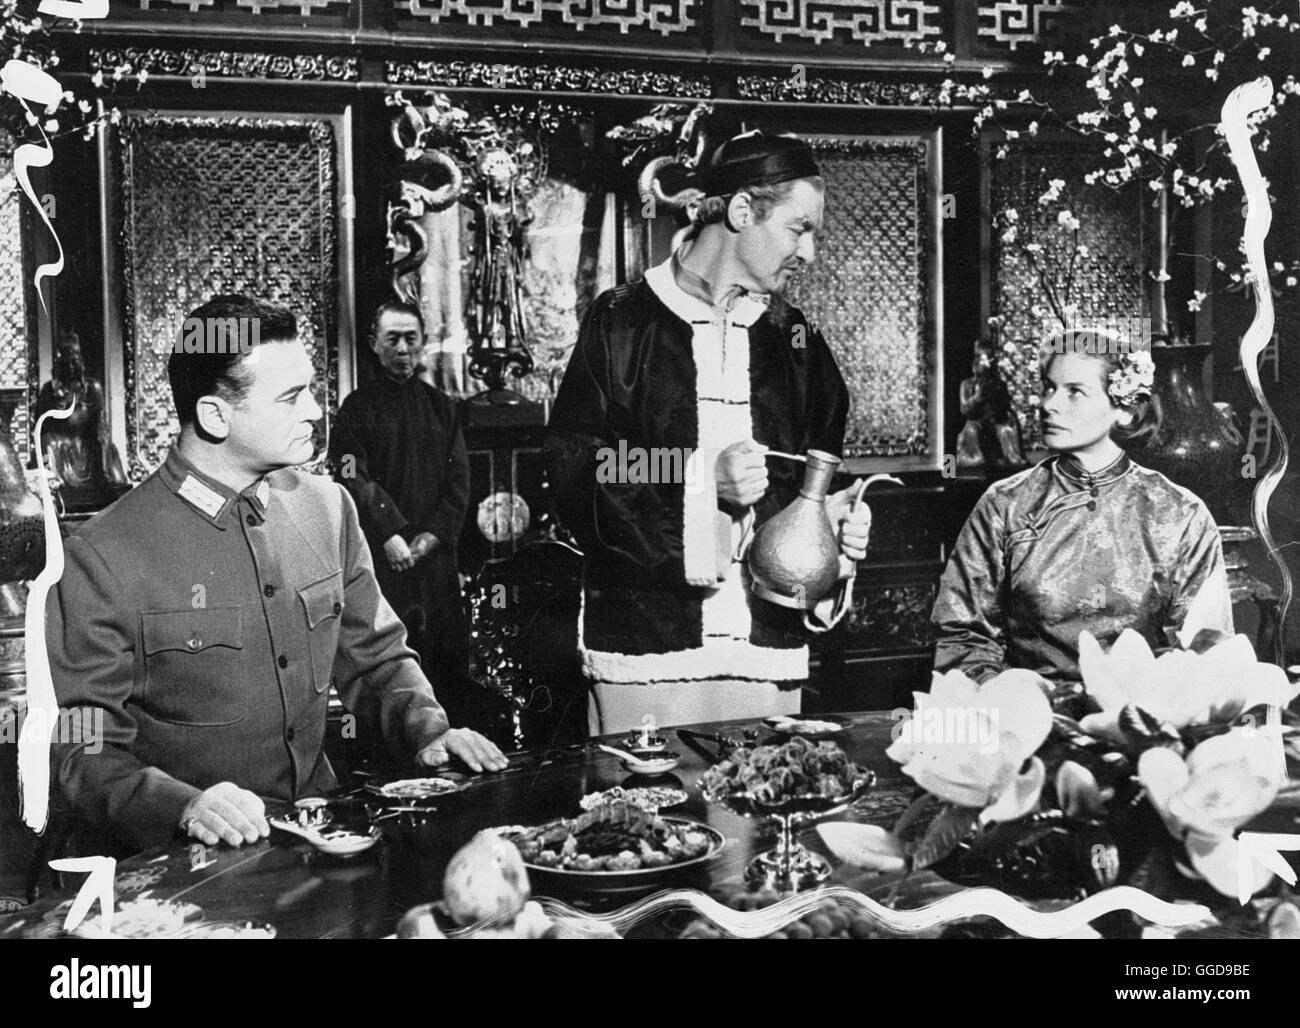 DIE HERBERGE ZUR 6. GLÜCKSELIGKEIT / The Inn of the Sixth Happiness USA 1958 / Mark Robson Szene mit CURD JÜRGENS Stock Photo